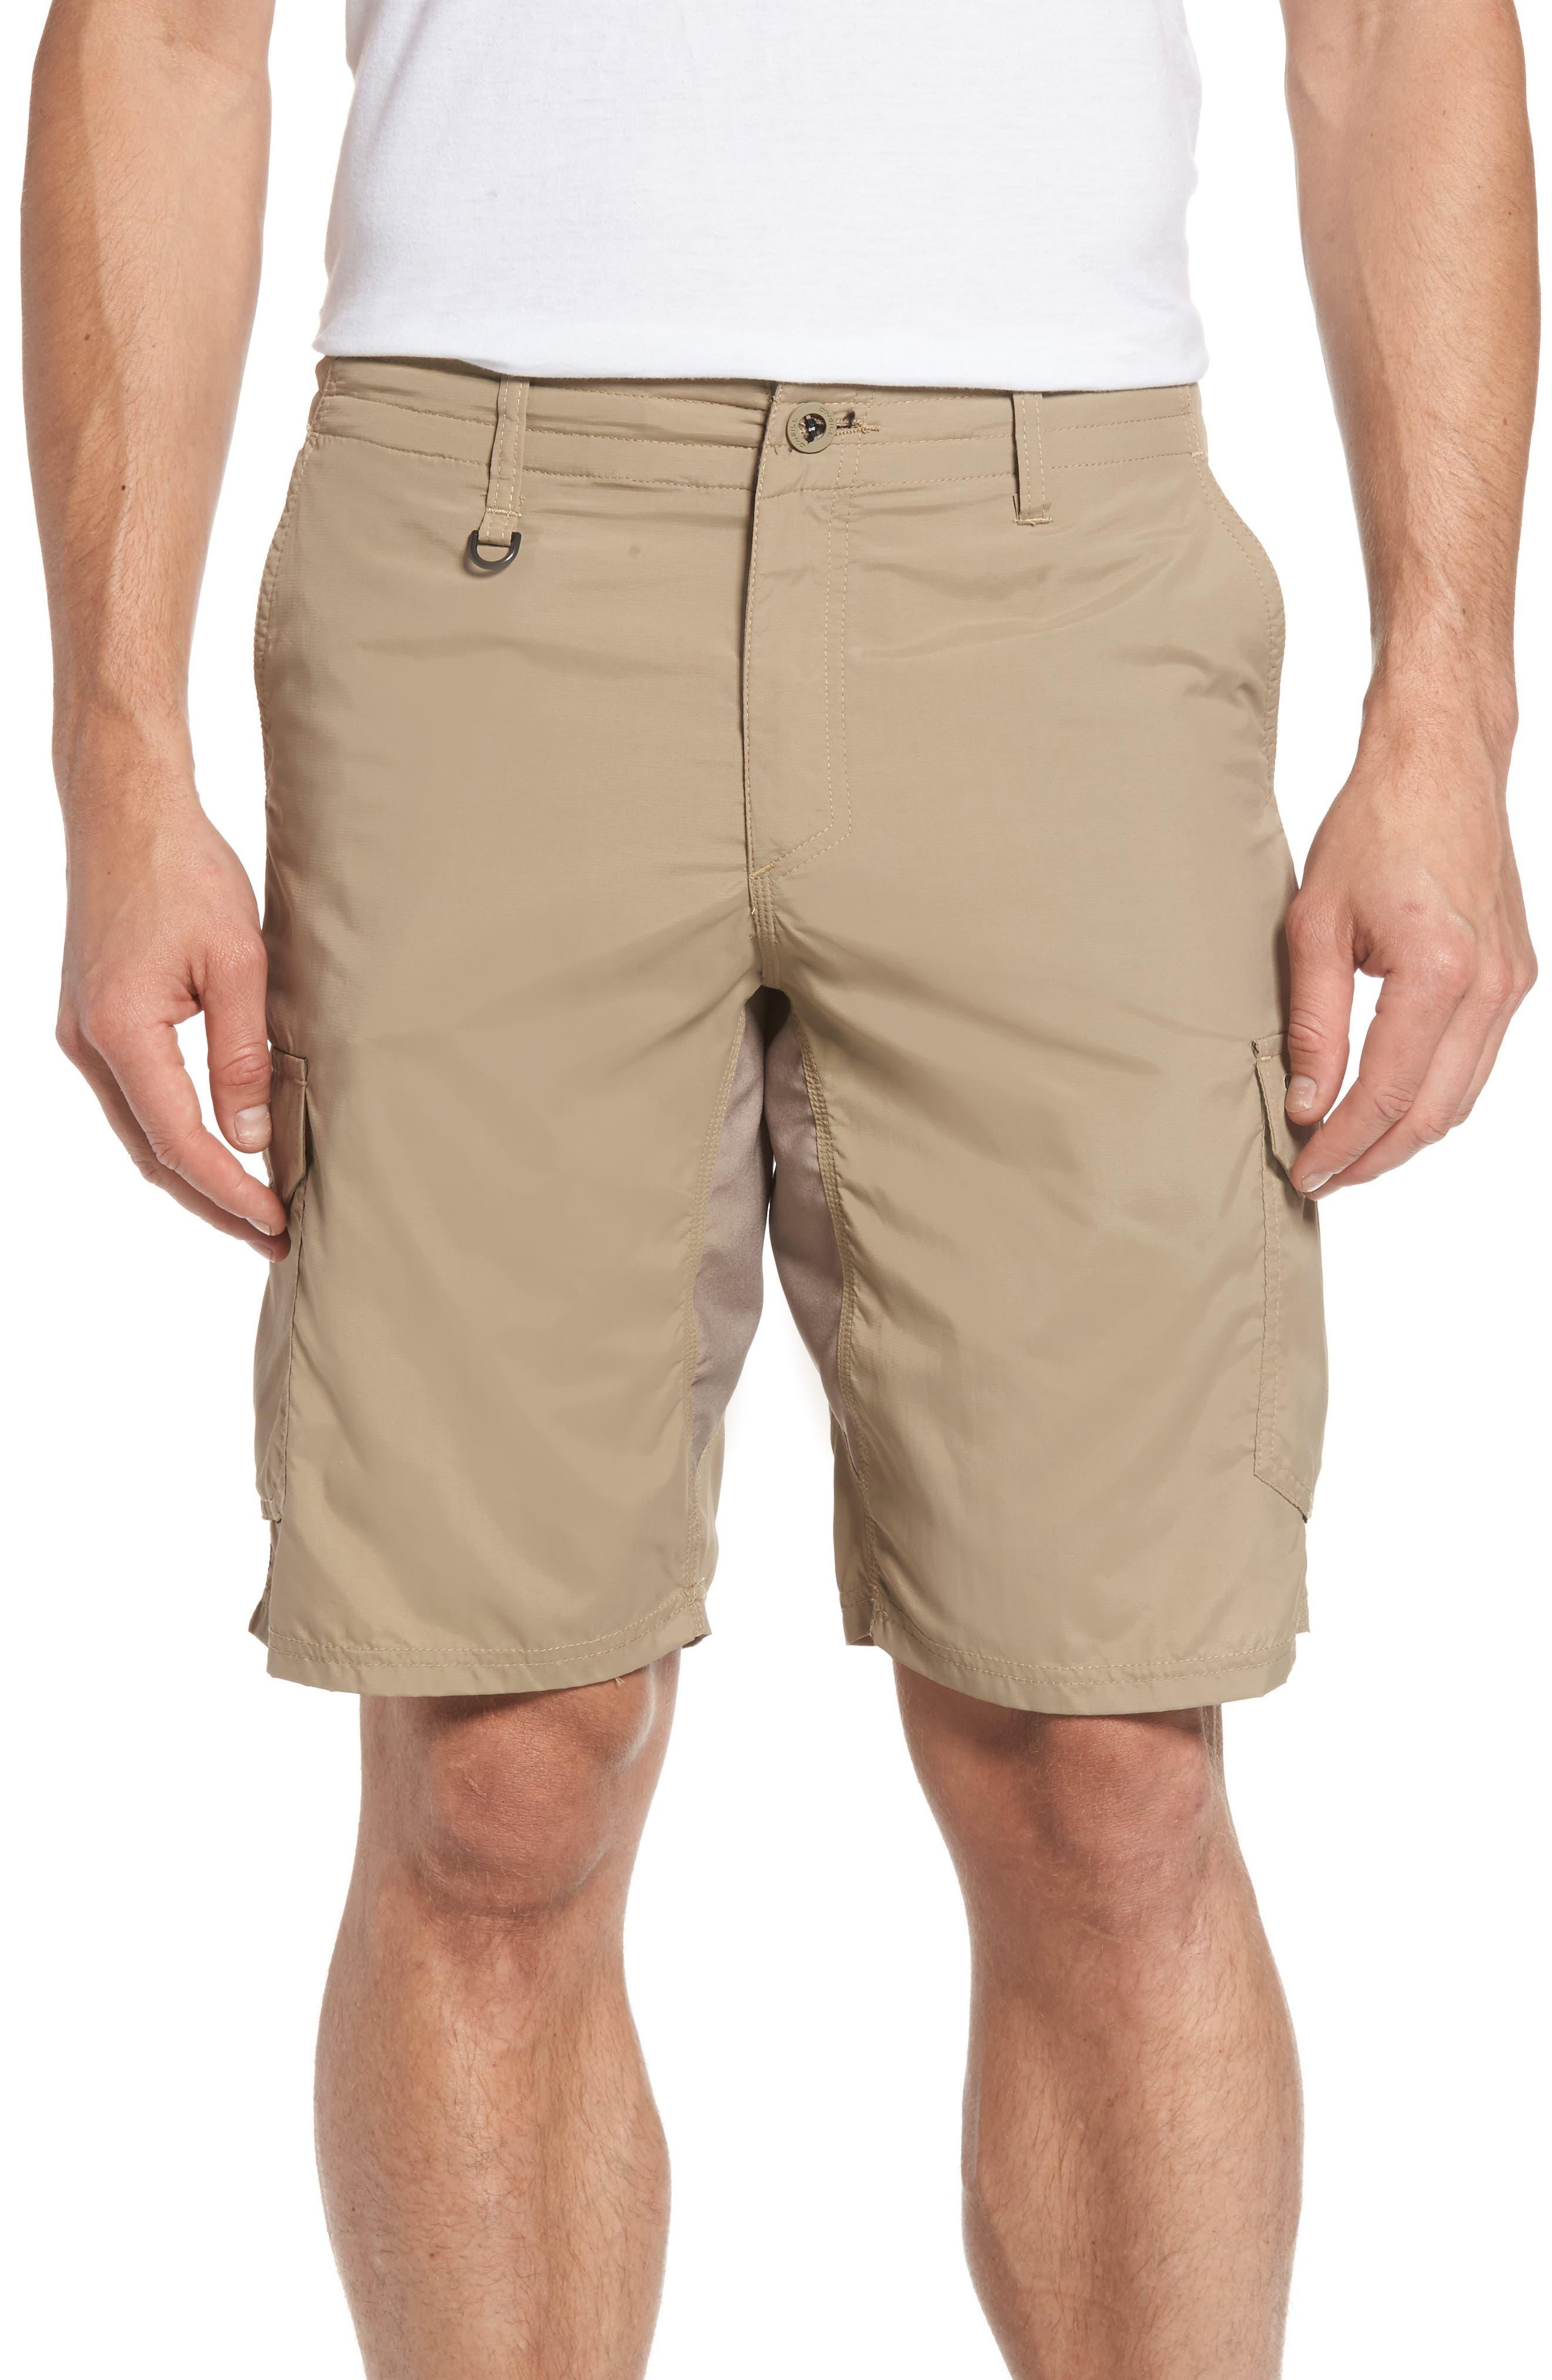 O'Neill Traveler Hybrid Cargo Shorts